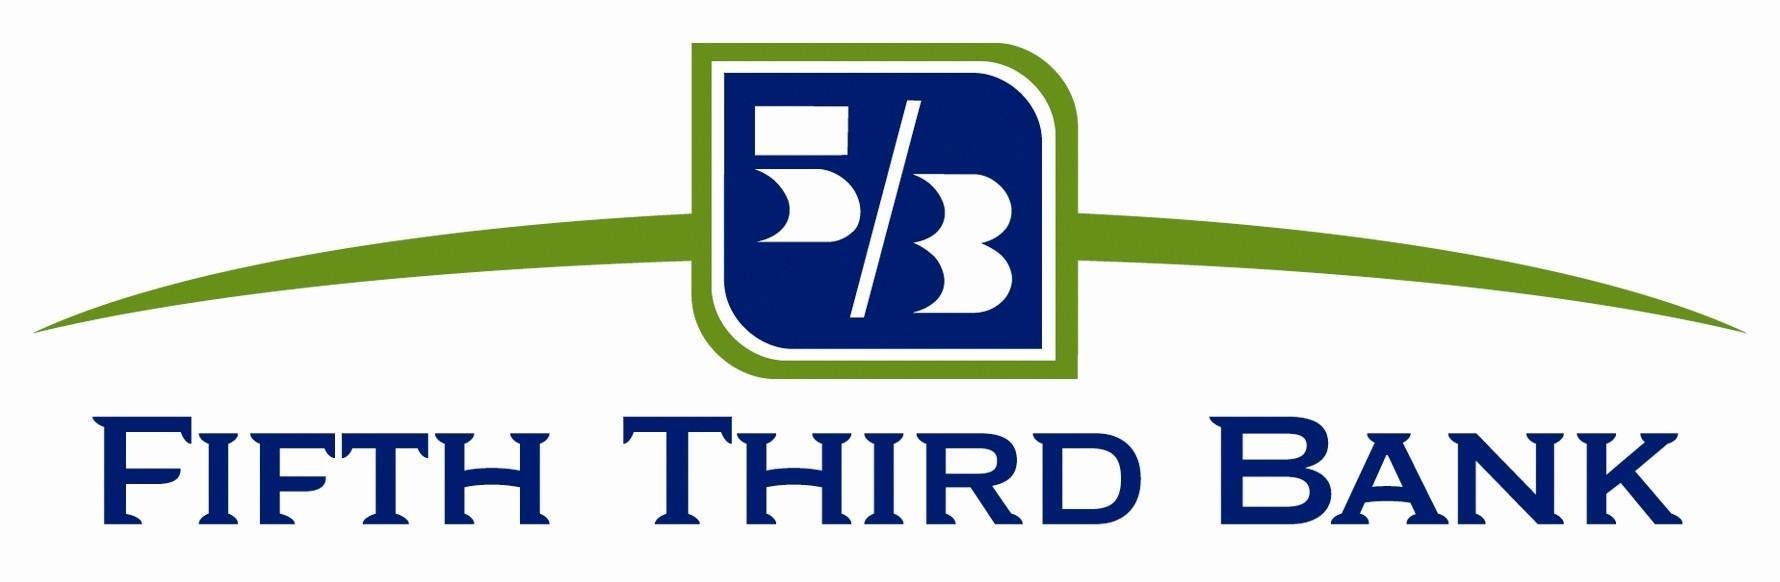 Fifth Third Bank company logo